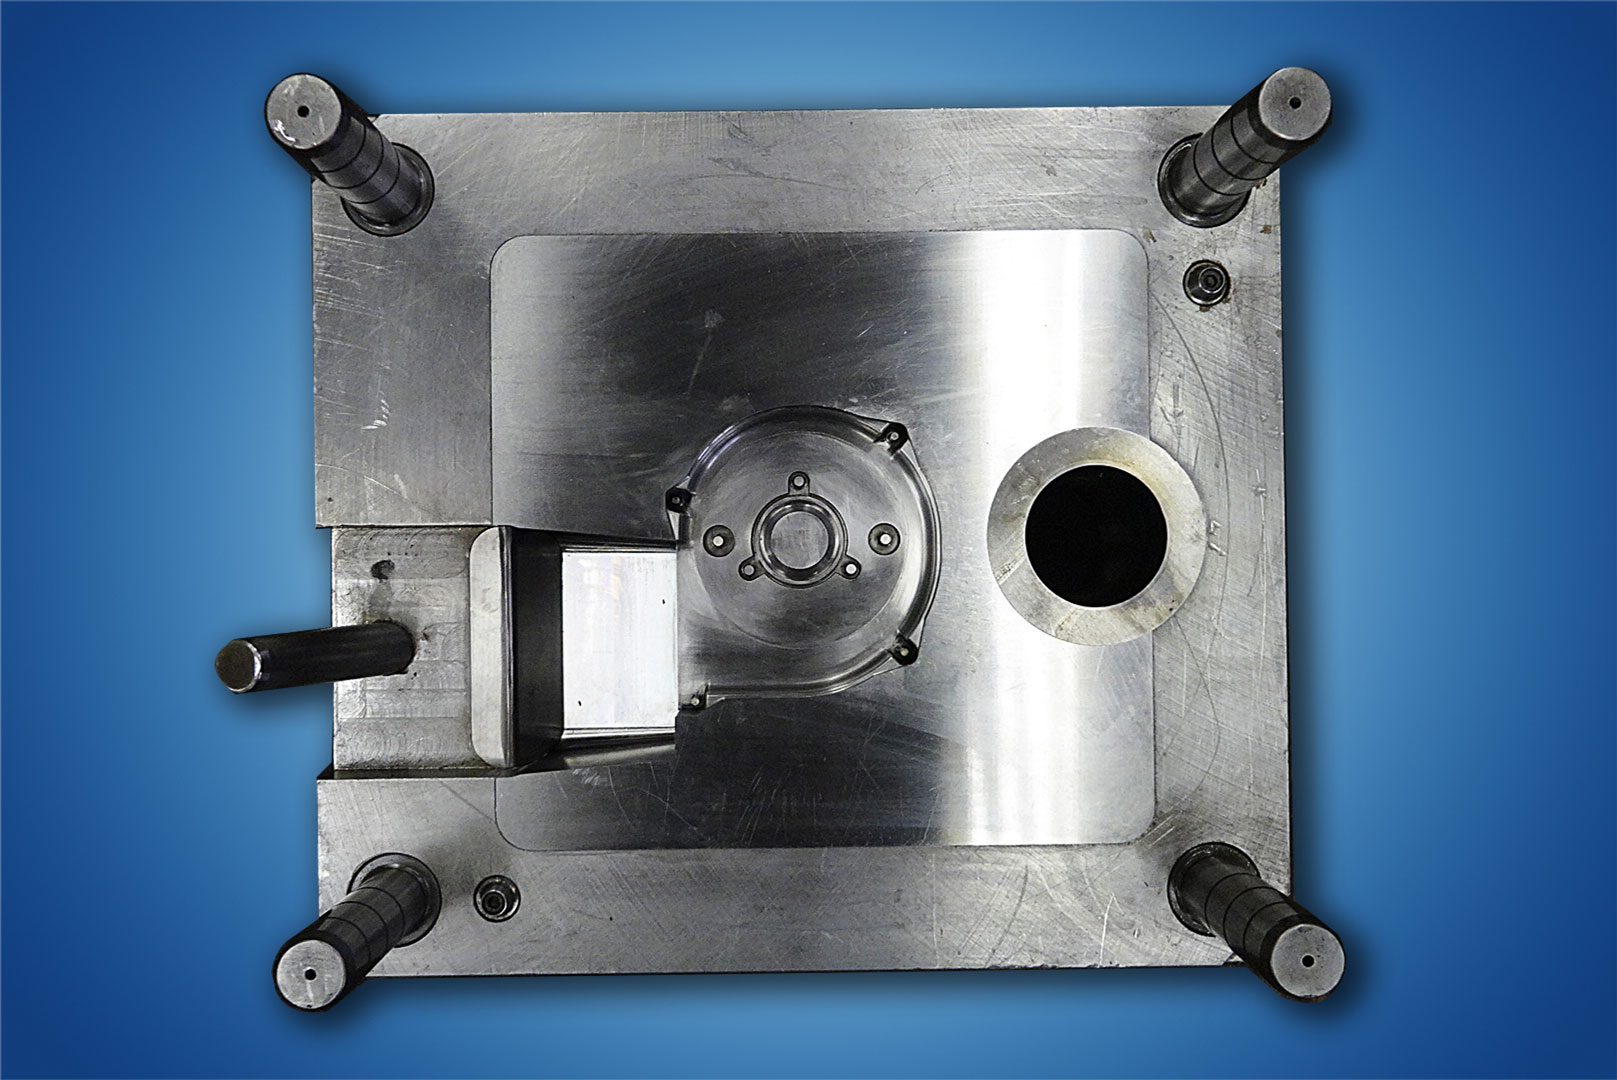 Ero-Projekt-d.o.o.-Toolshop-Werkzeugbau-5-Orodja-za-tlacno-litje-_-slika-4